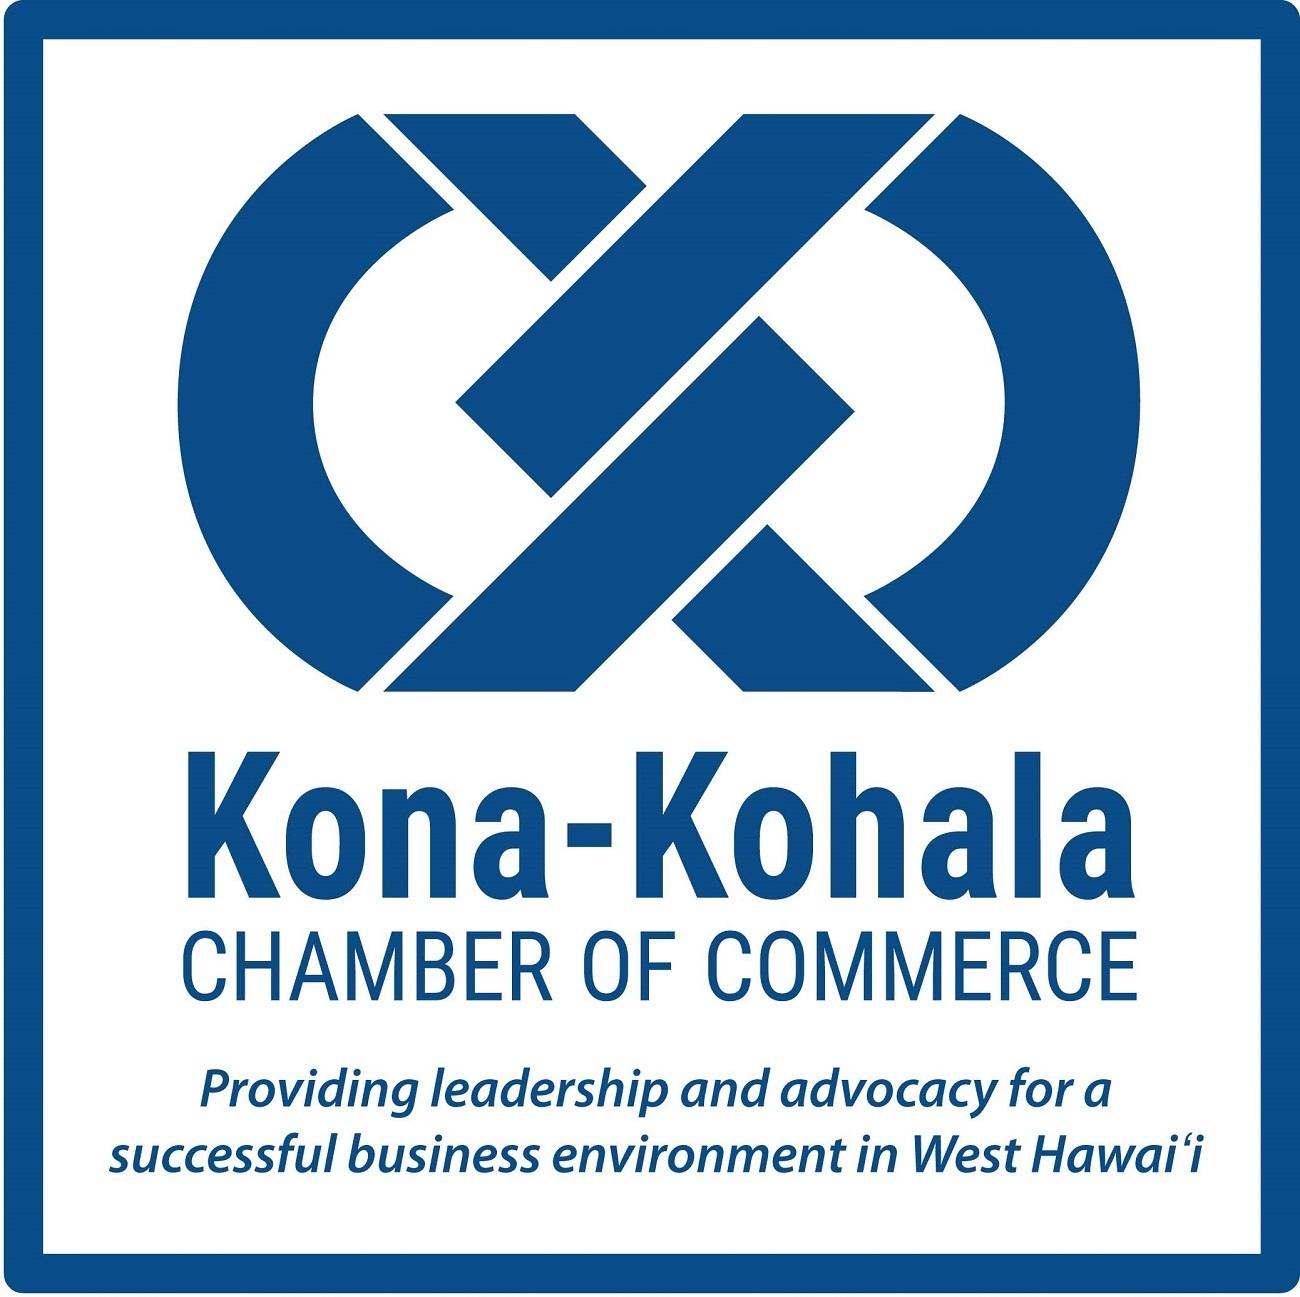 Notice to Members:  Kona-Kohala Chamber of Commerce Seeking Board Nominations.